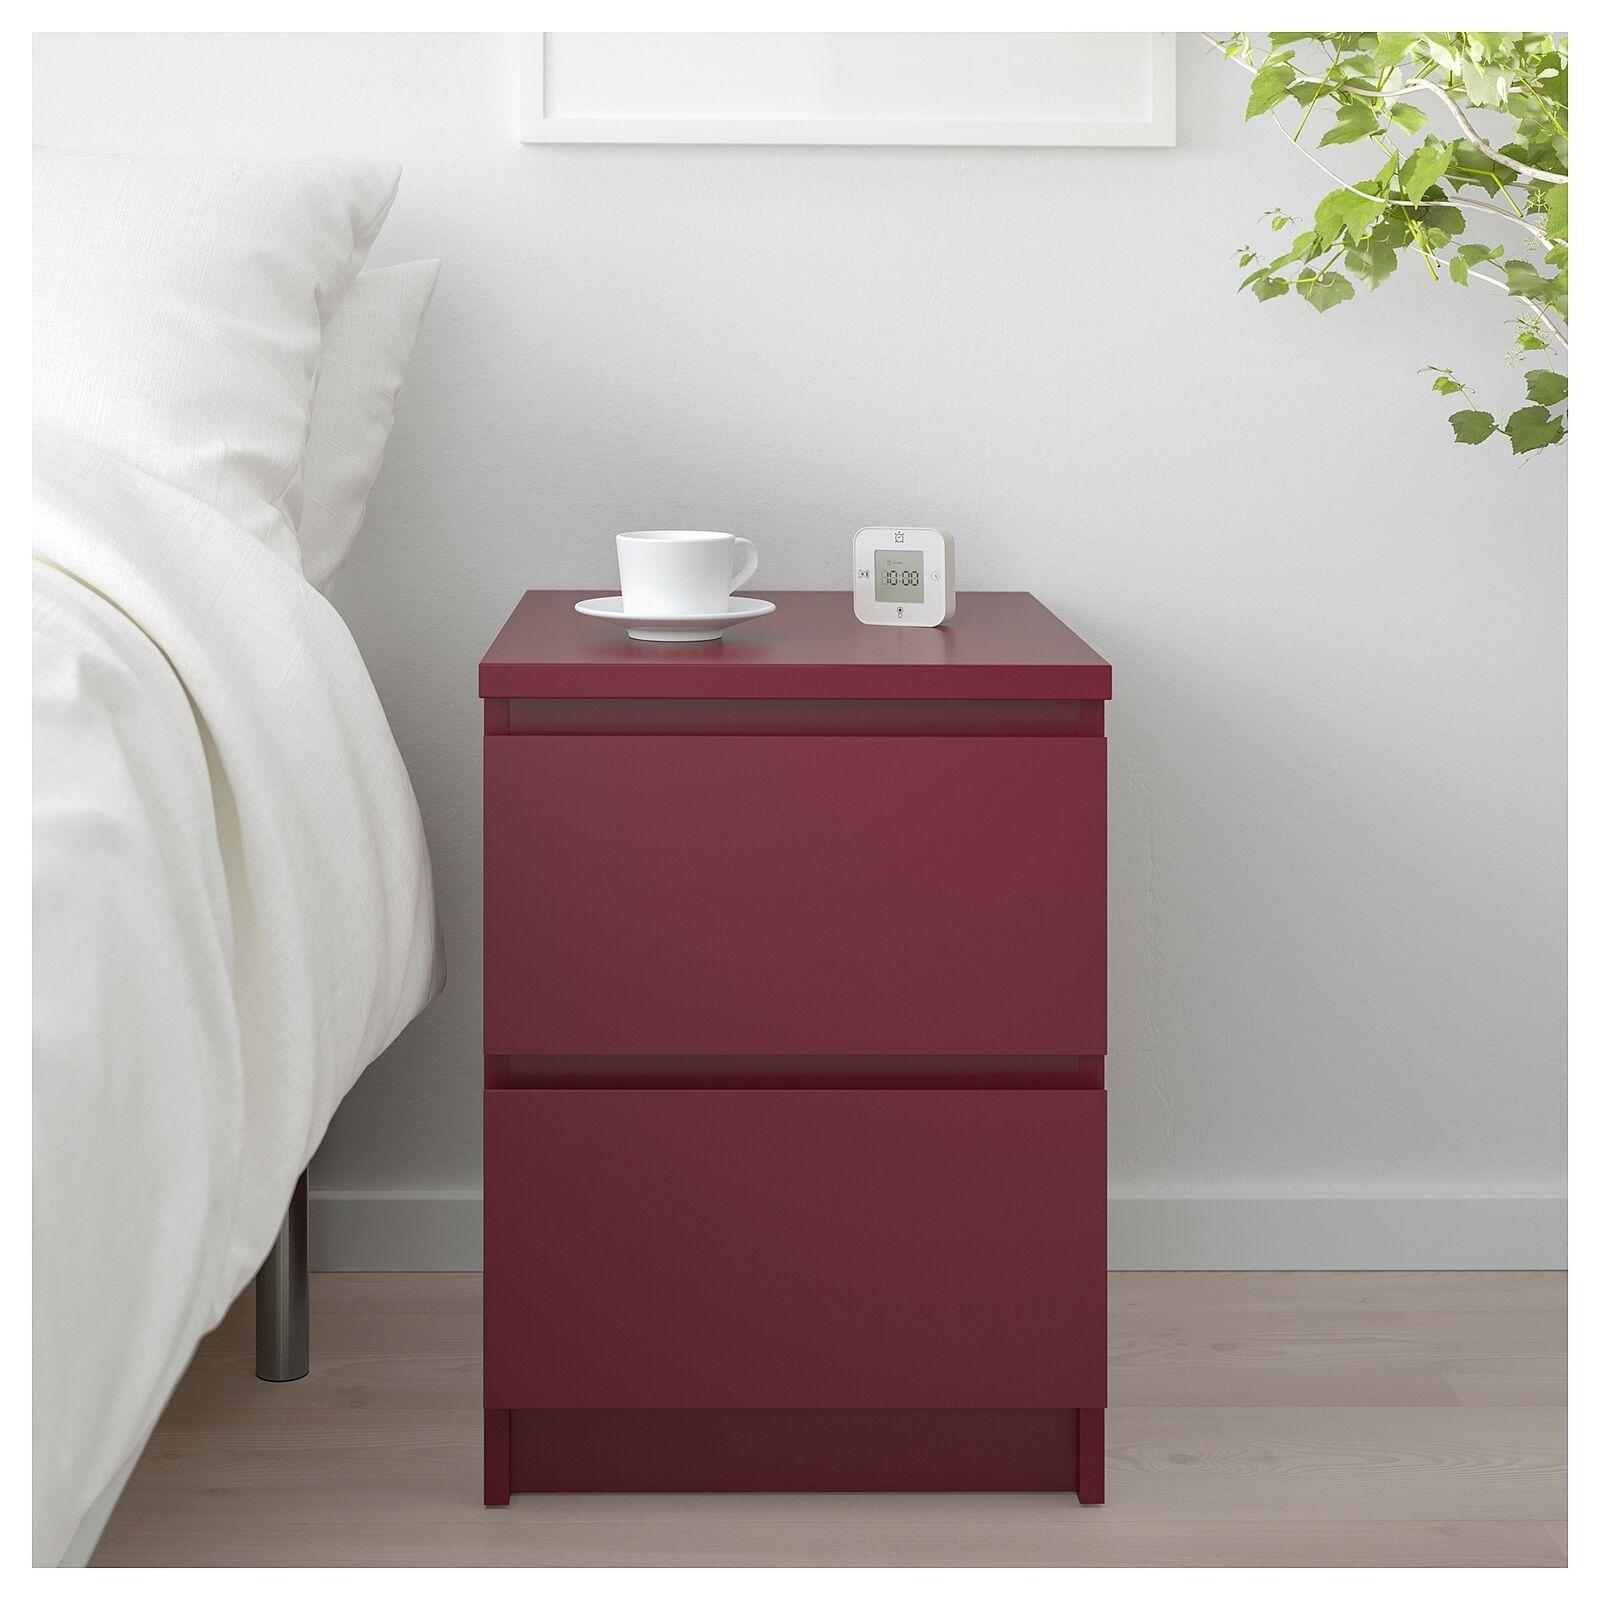 Ikea Malm 2 Drawer Chest Nightstand Dark Red